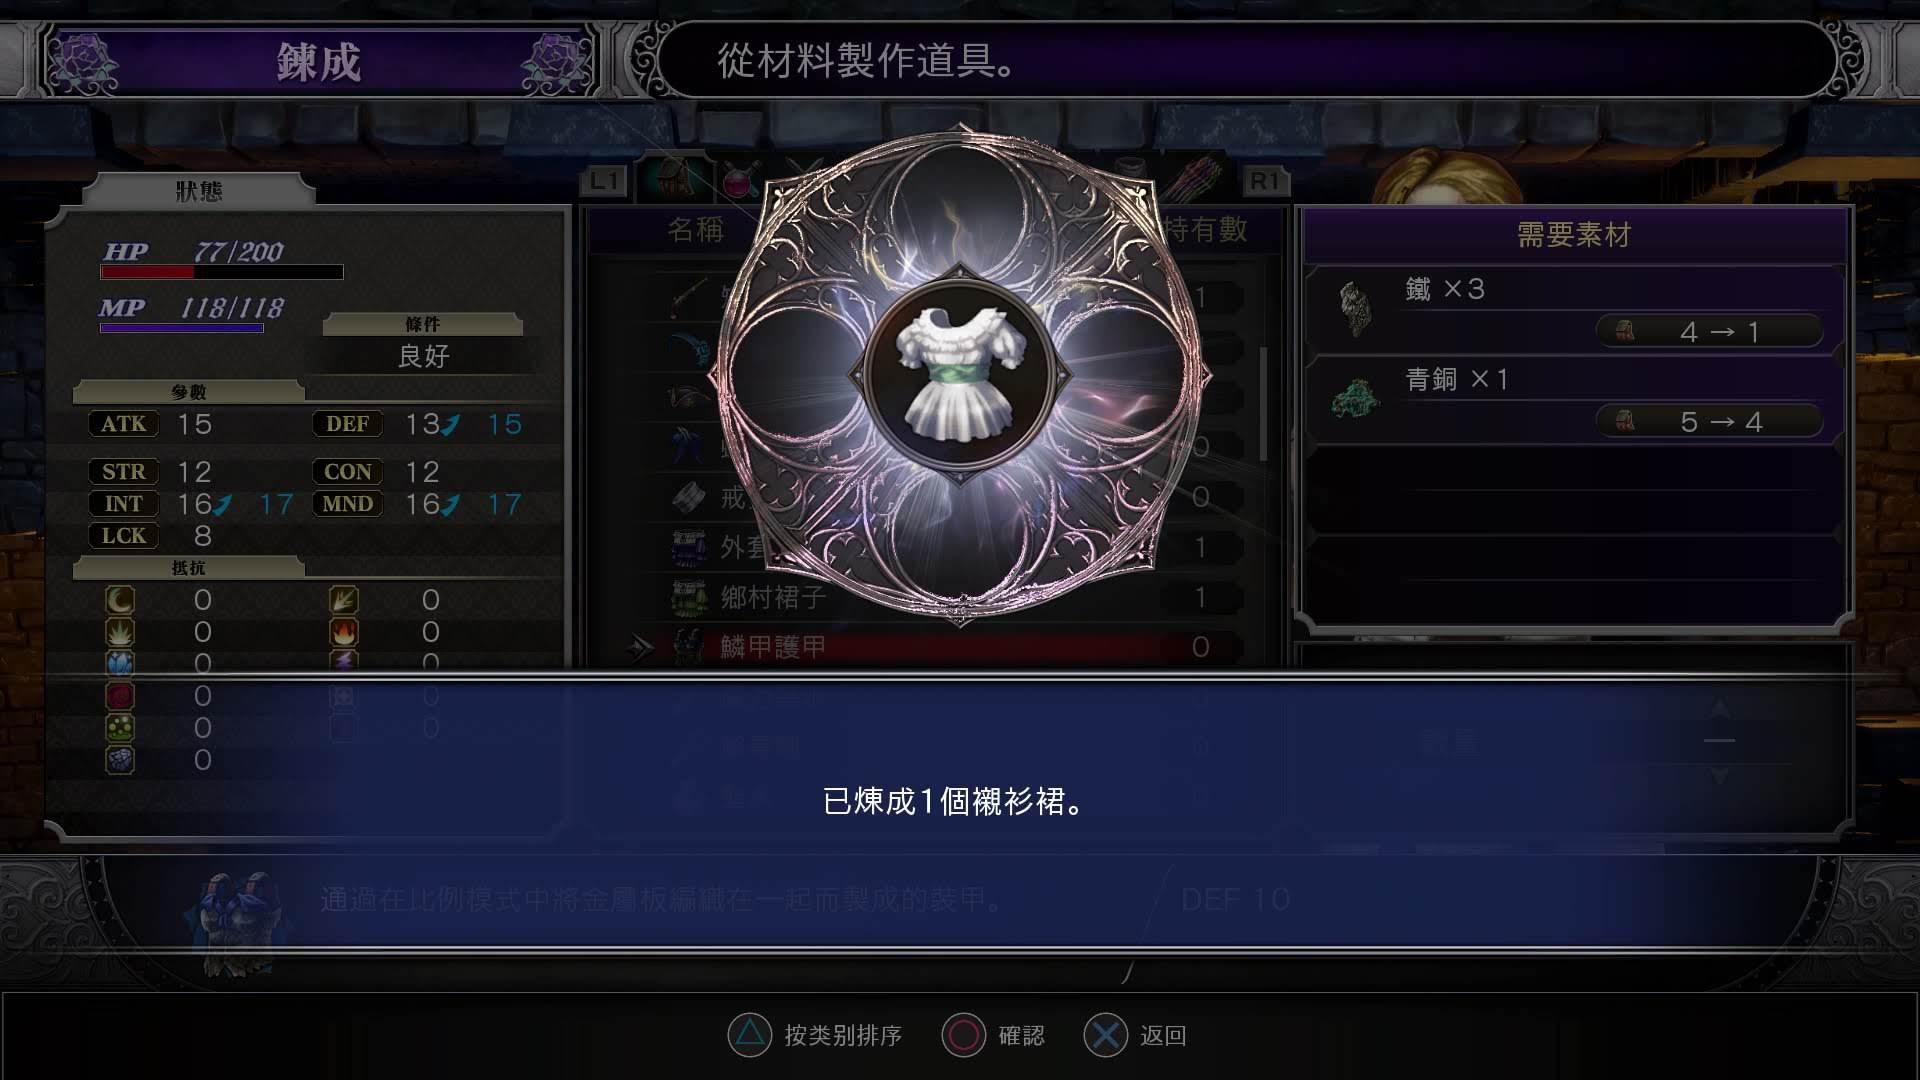 [RPG大作]惡魔城之父最新作《血咒之城:暗夜儀式》官方繁體中文硬碟版